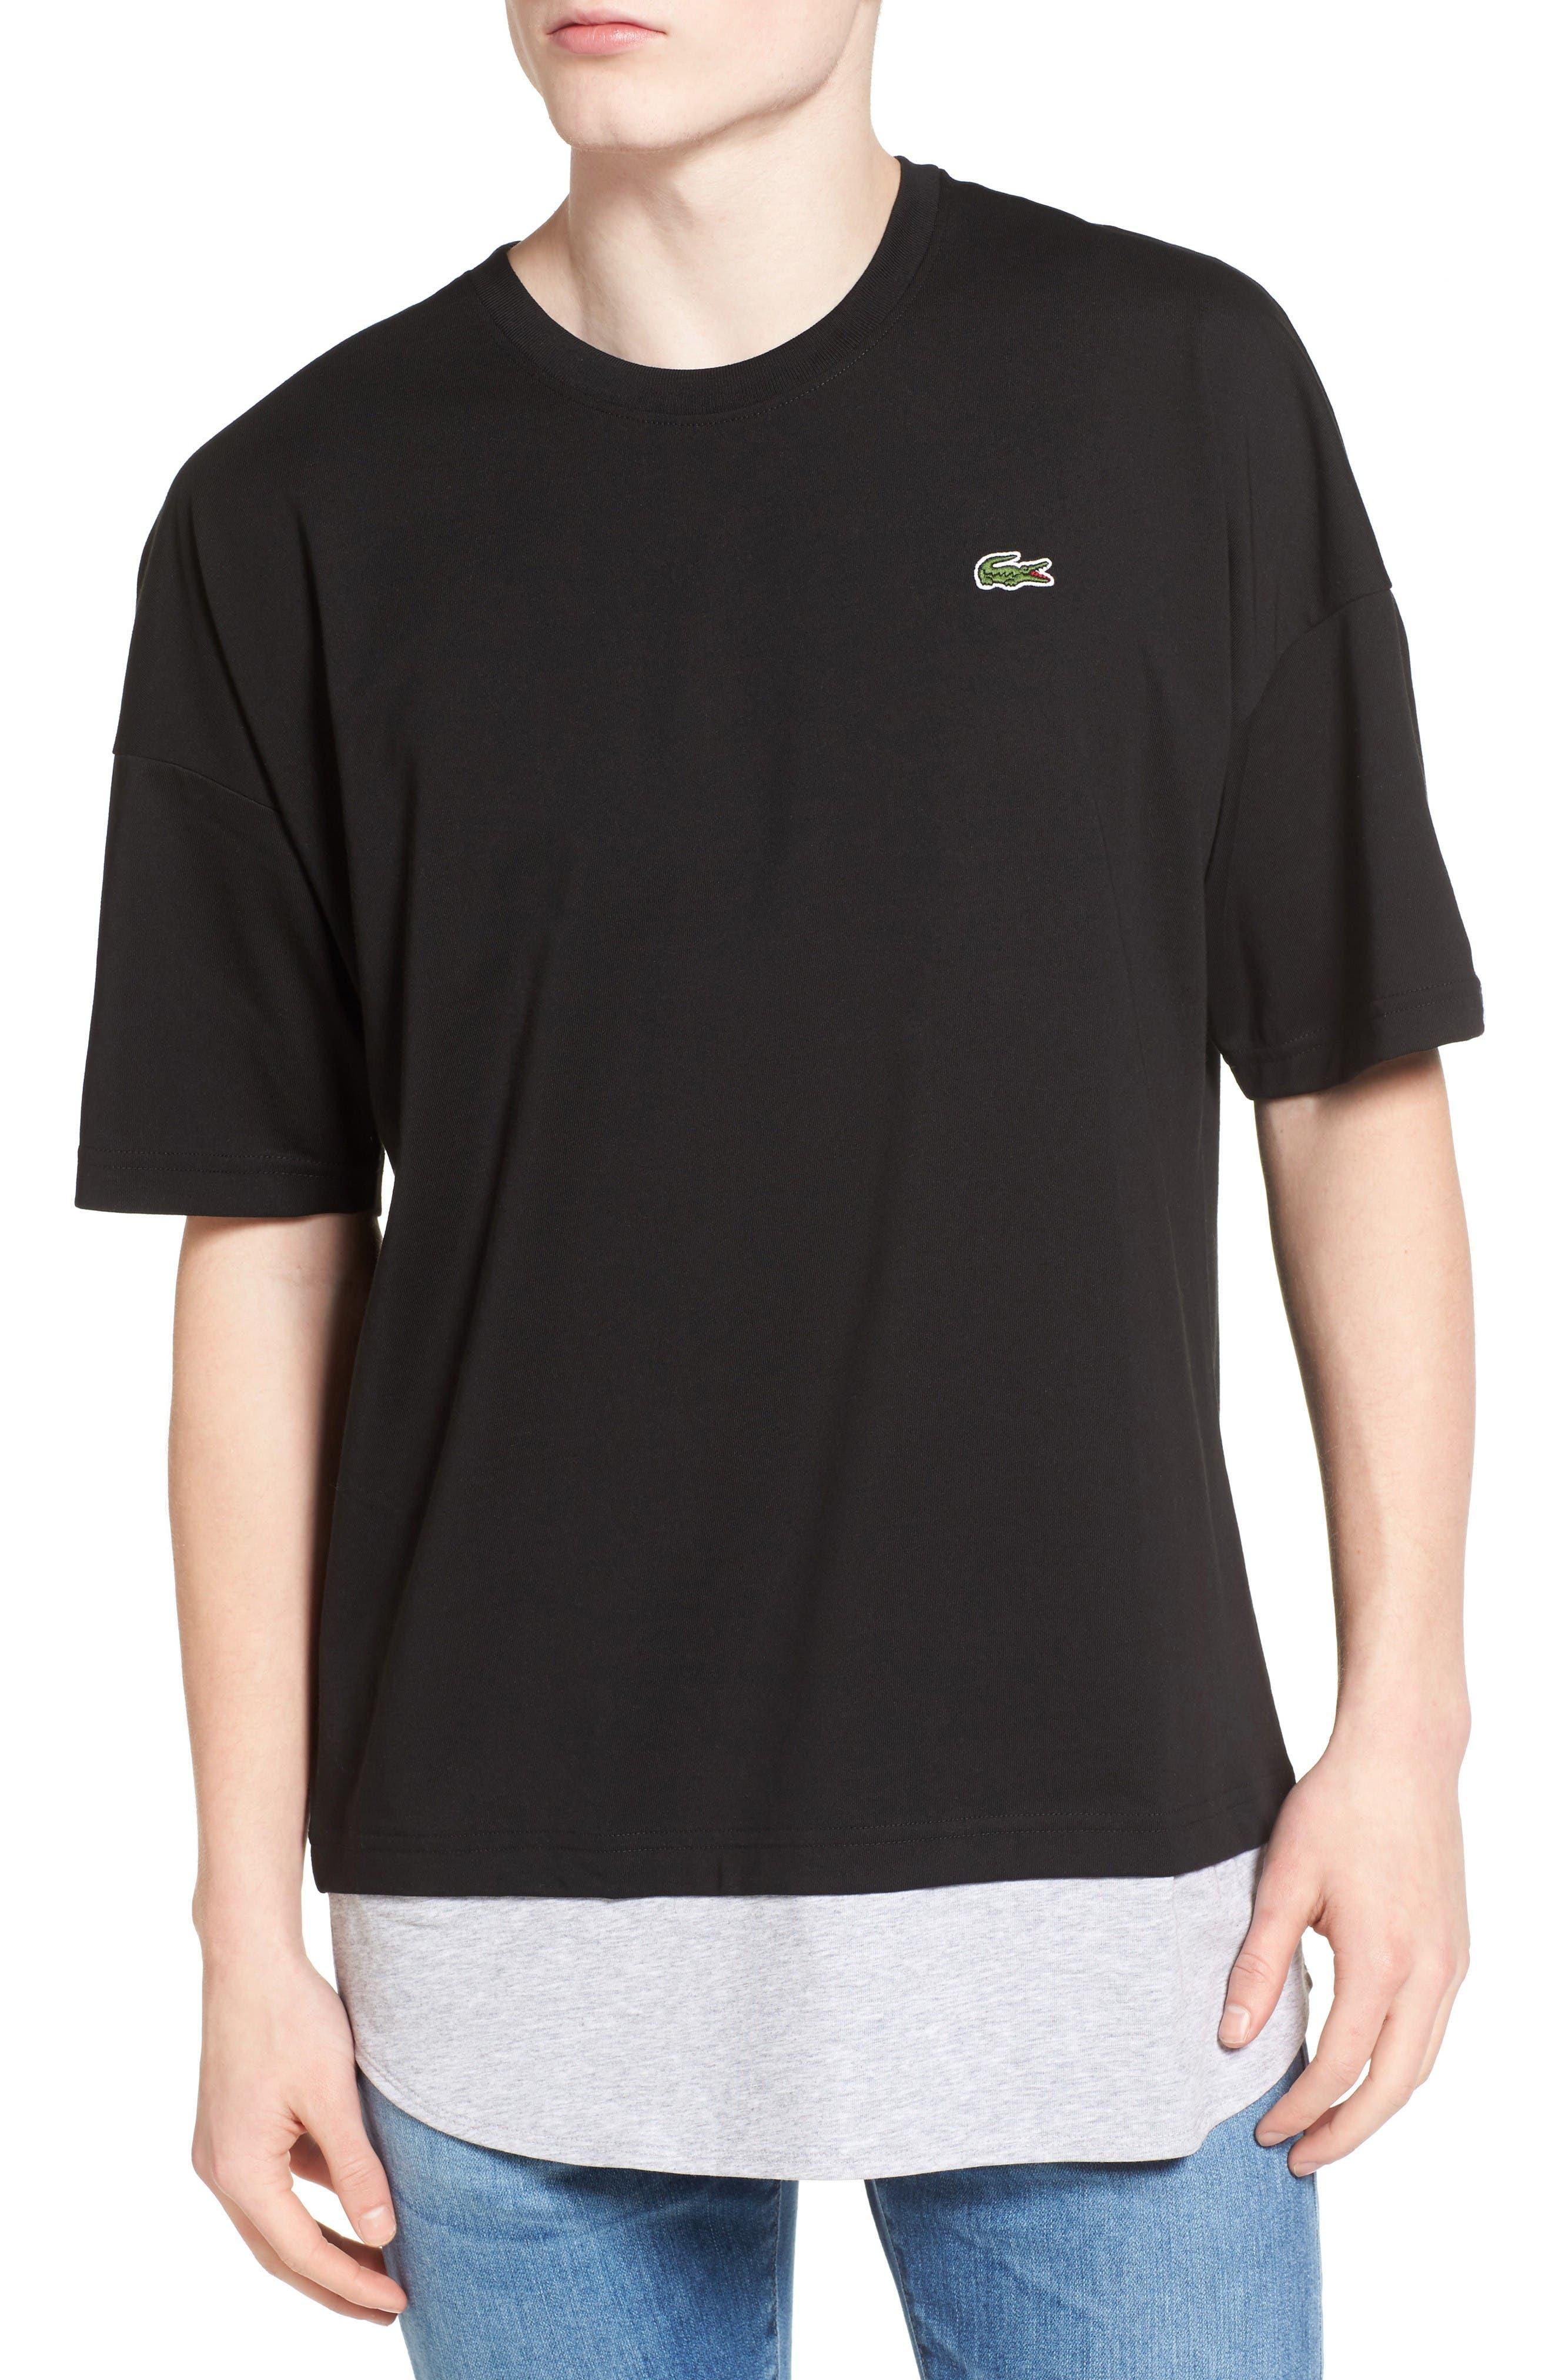 Main Image - Lacoste L!VE Mock Layer T-Shirt